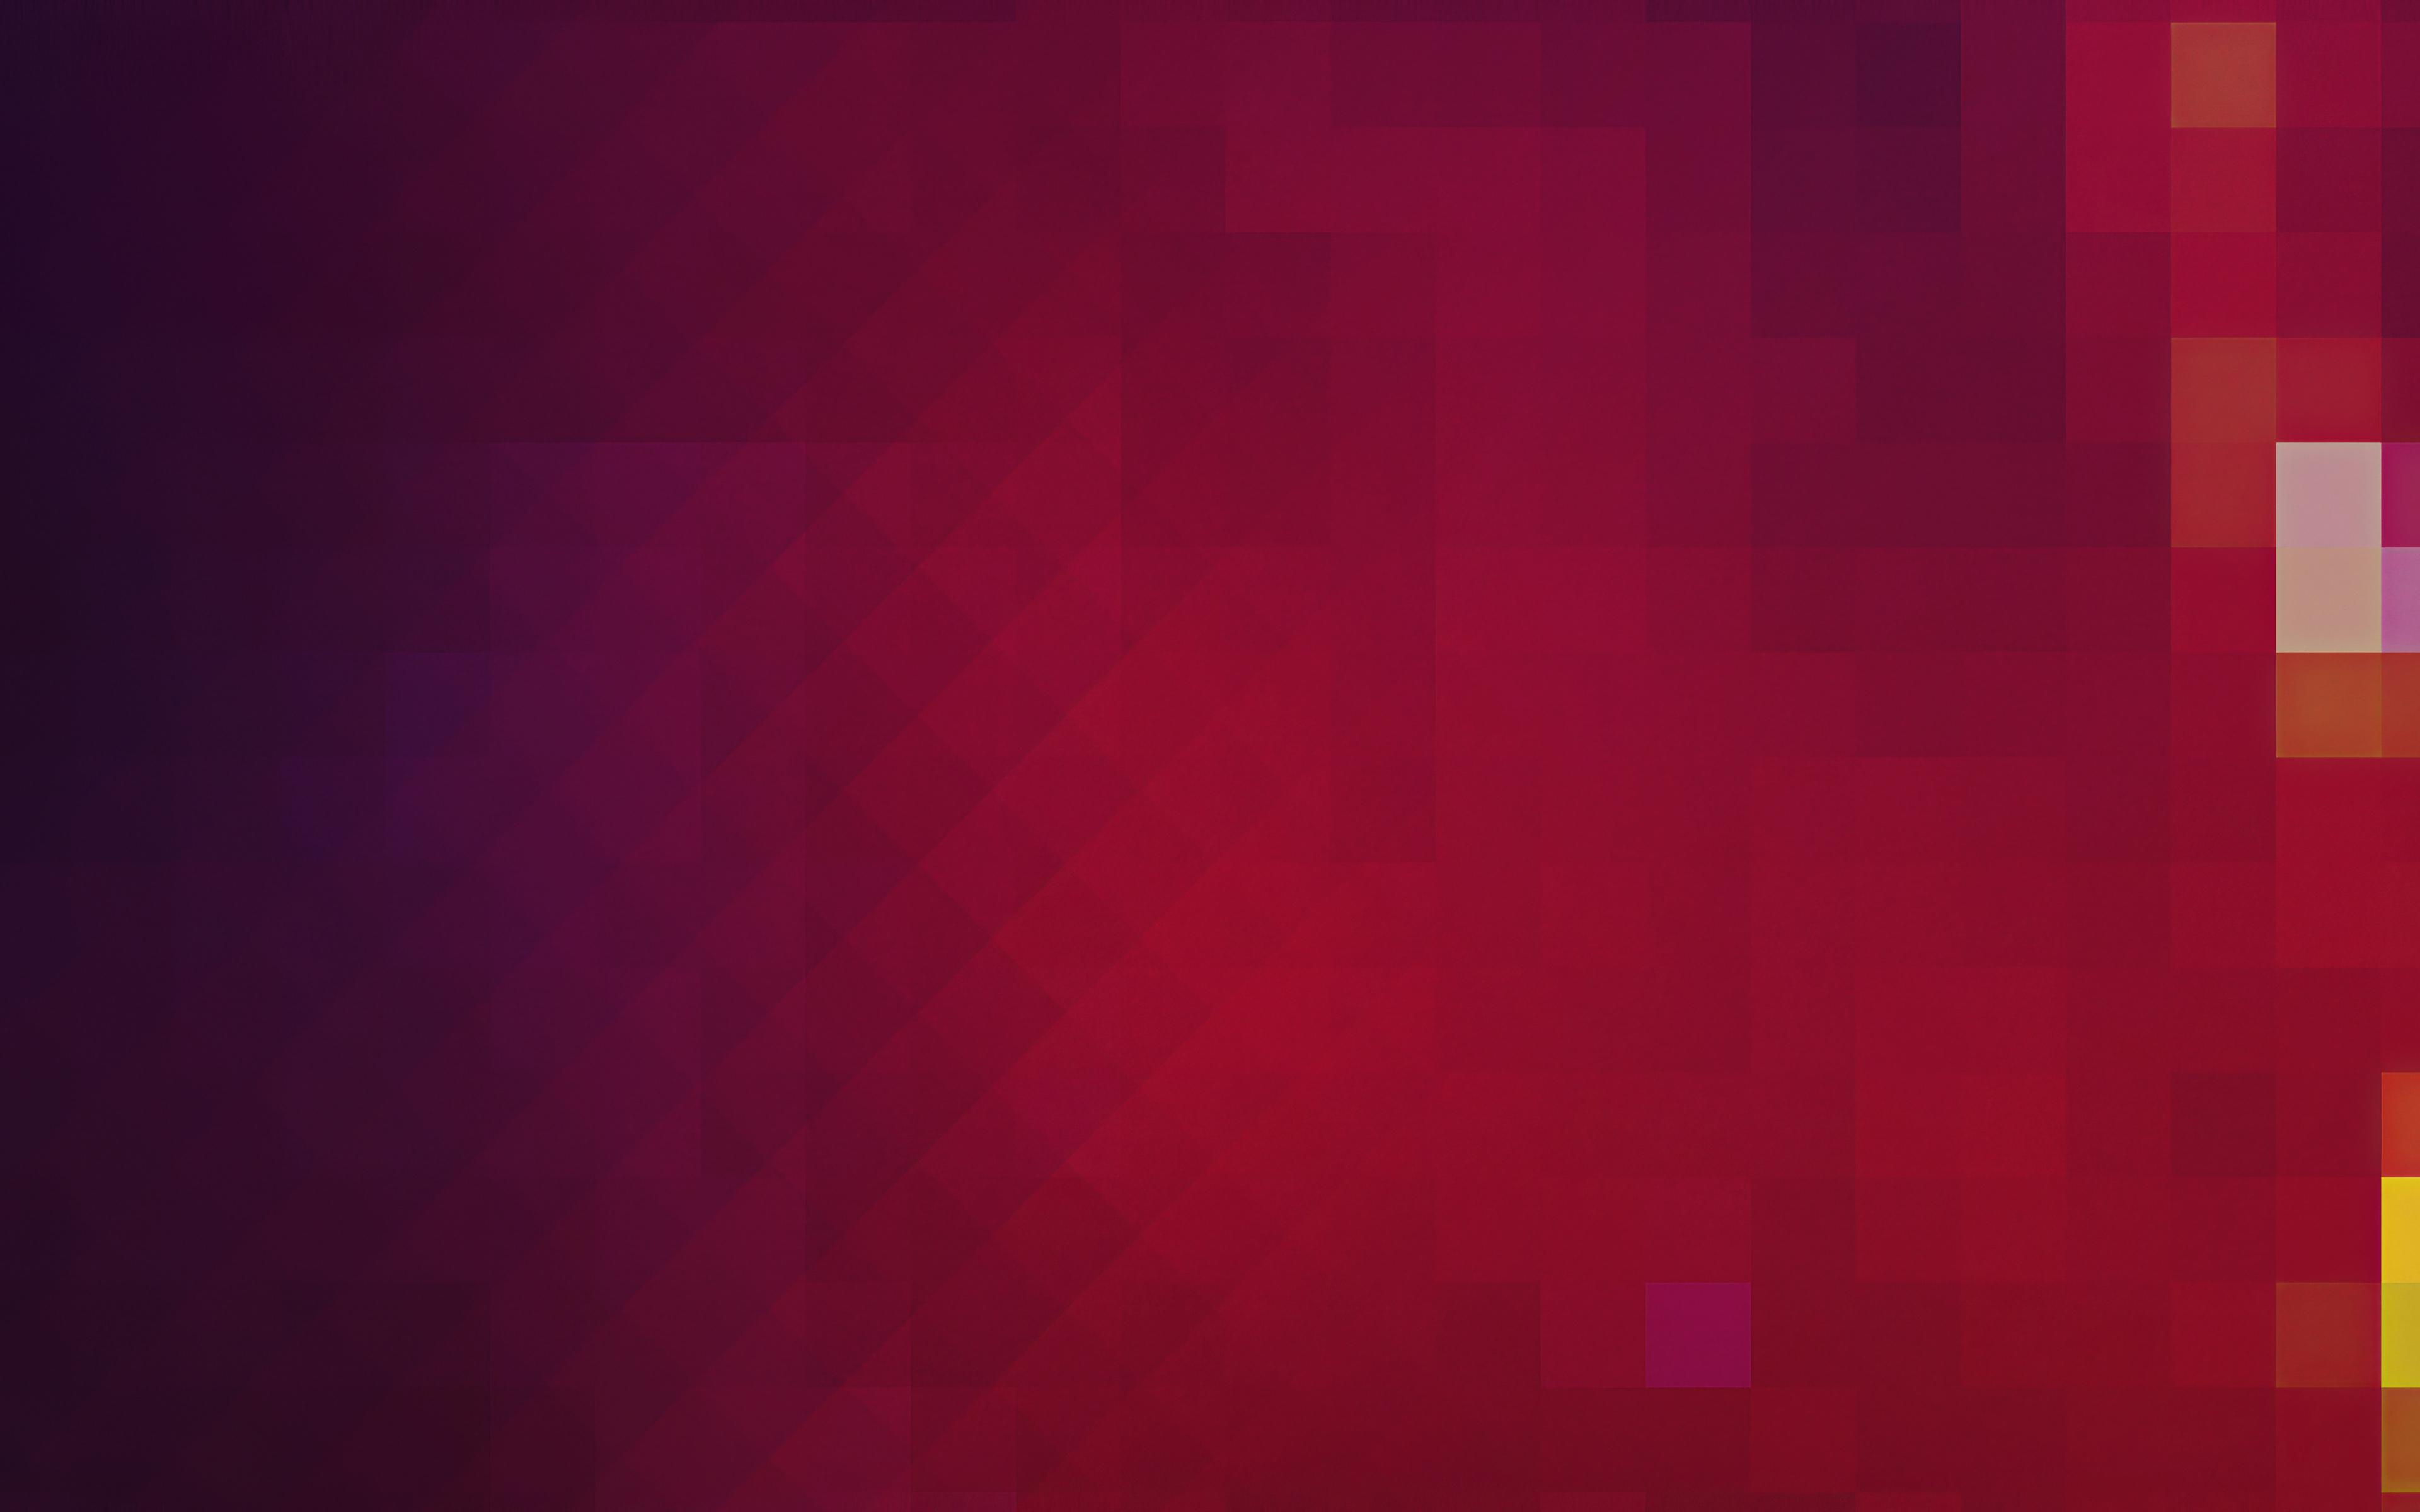 pixie-abstract-art-4k-wz.jpg